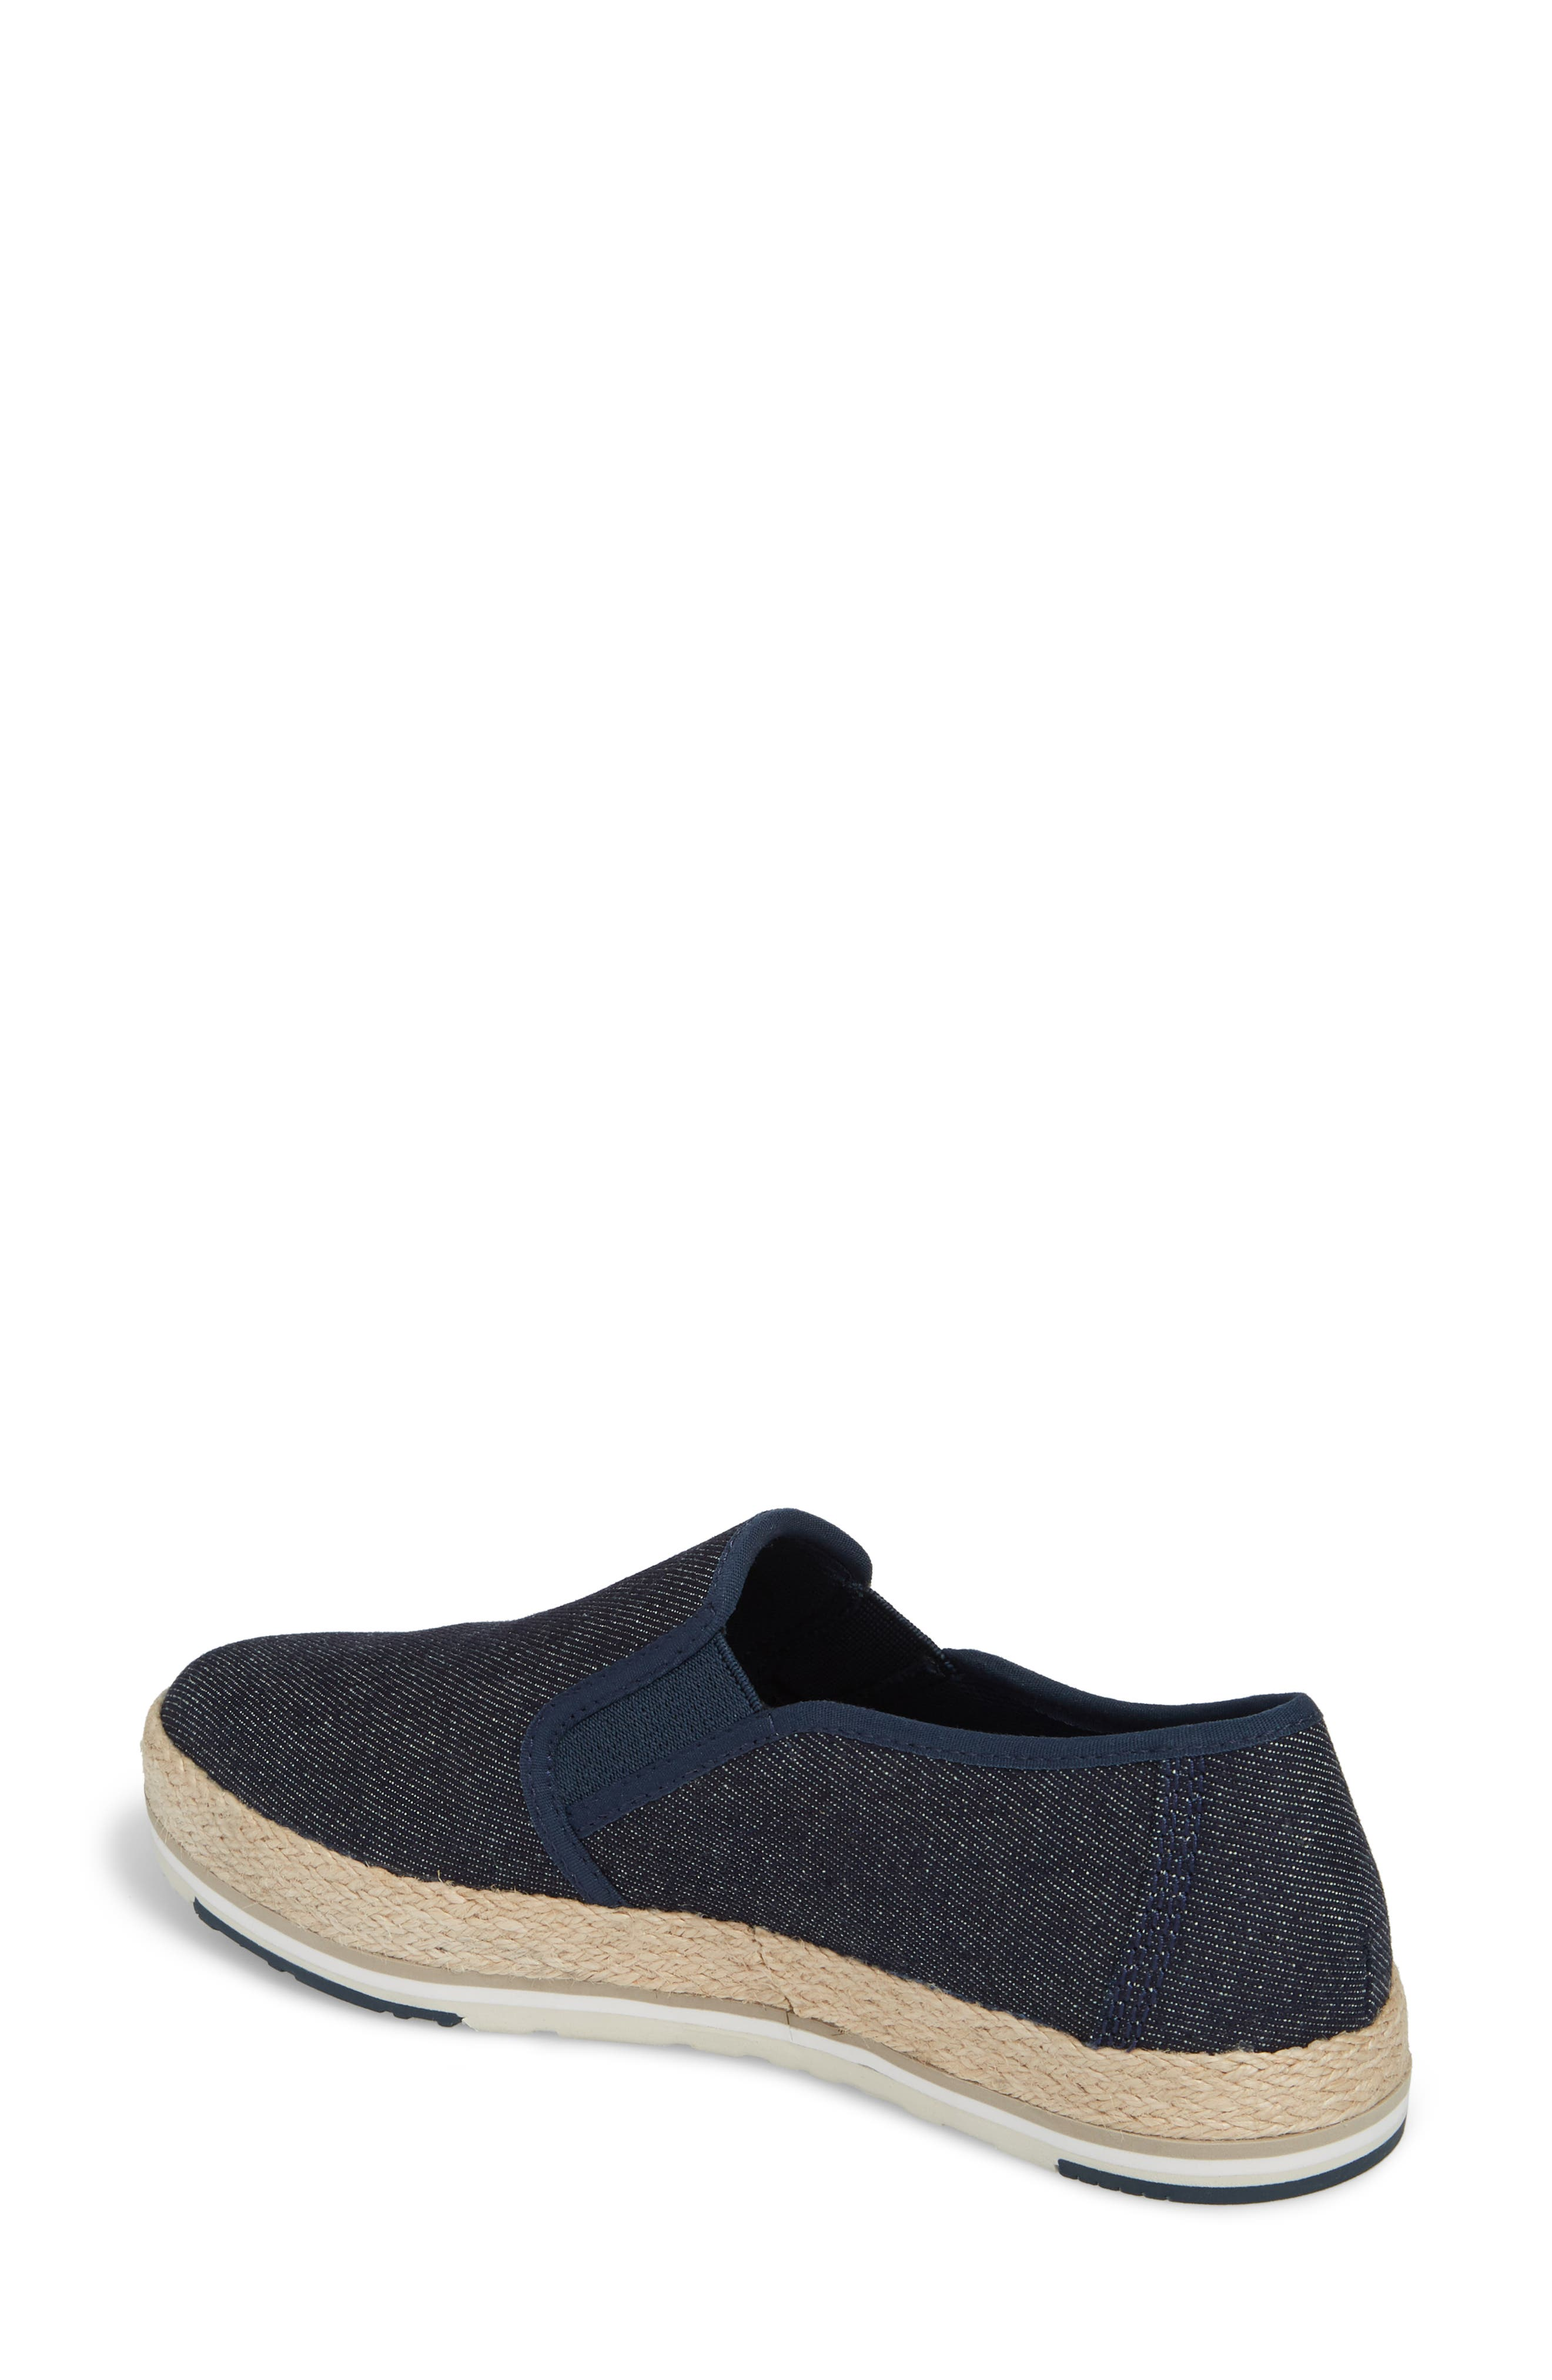 Eivissa Sea Slip-On Sneaker,                             Alternate thumbnail 2, color,                             Navy Canvas